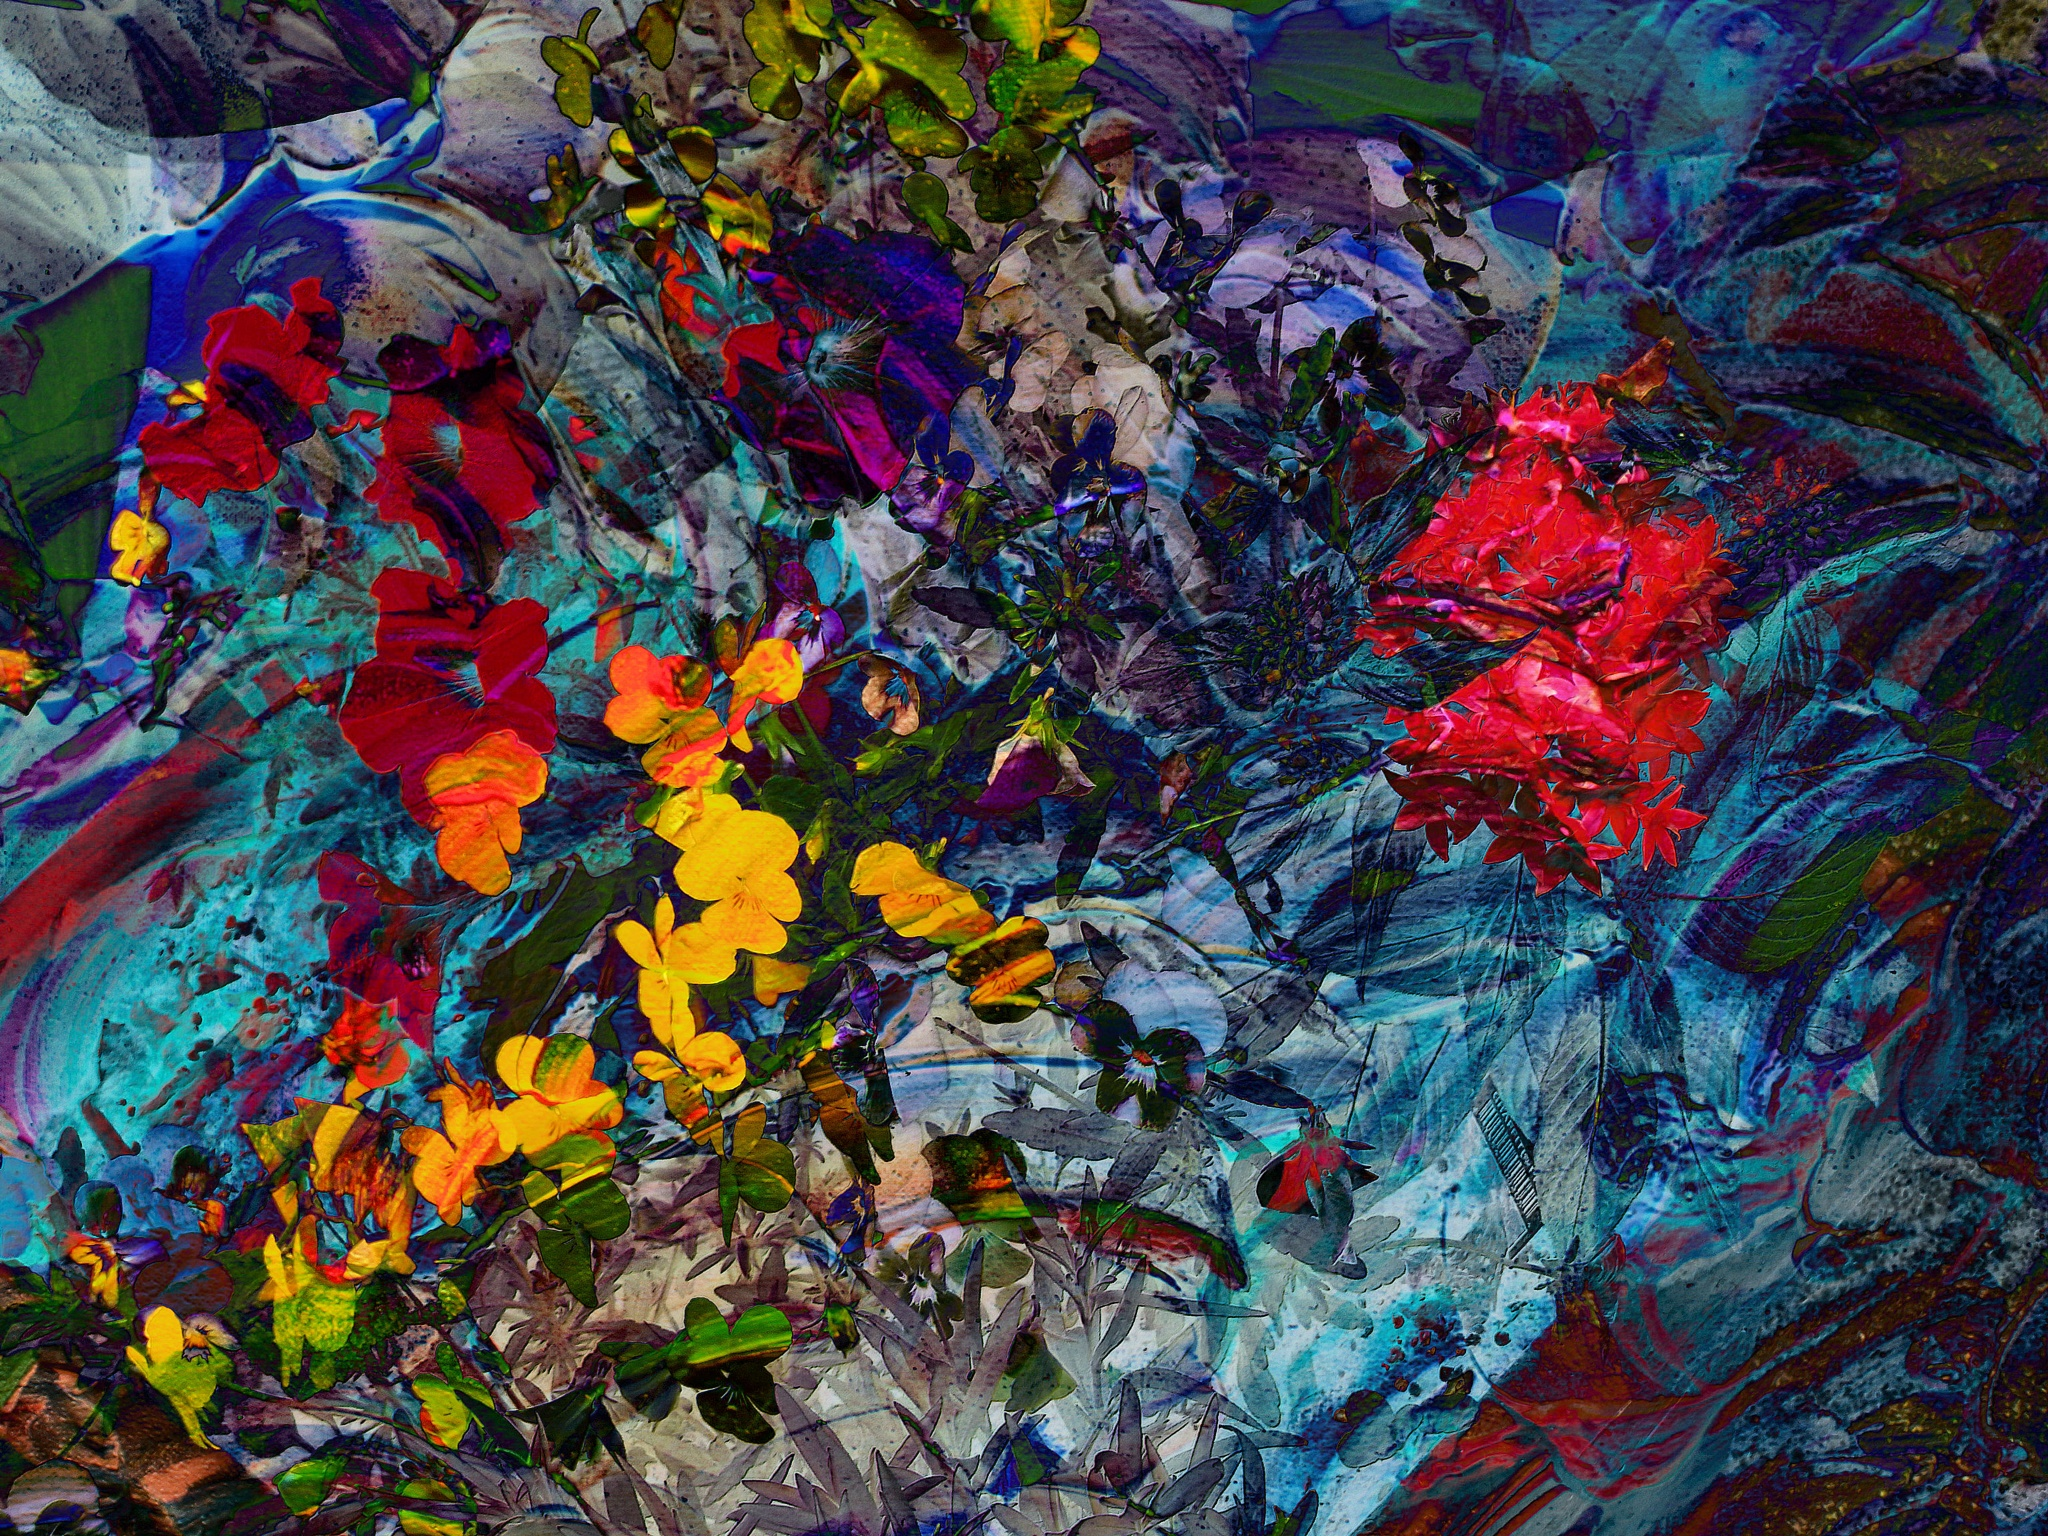 Untitled by VanWyck